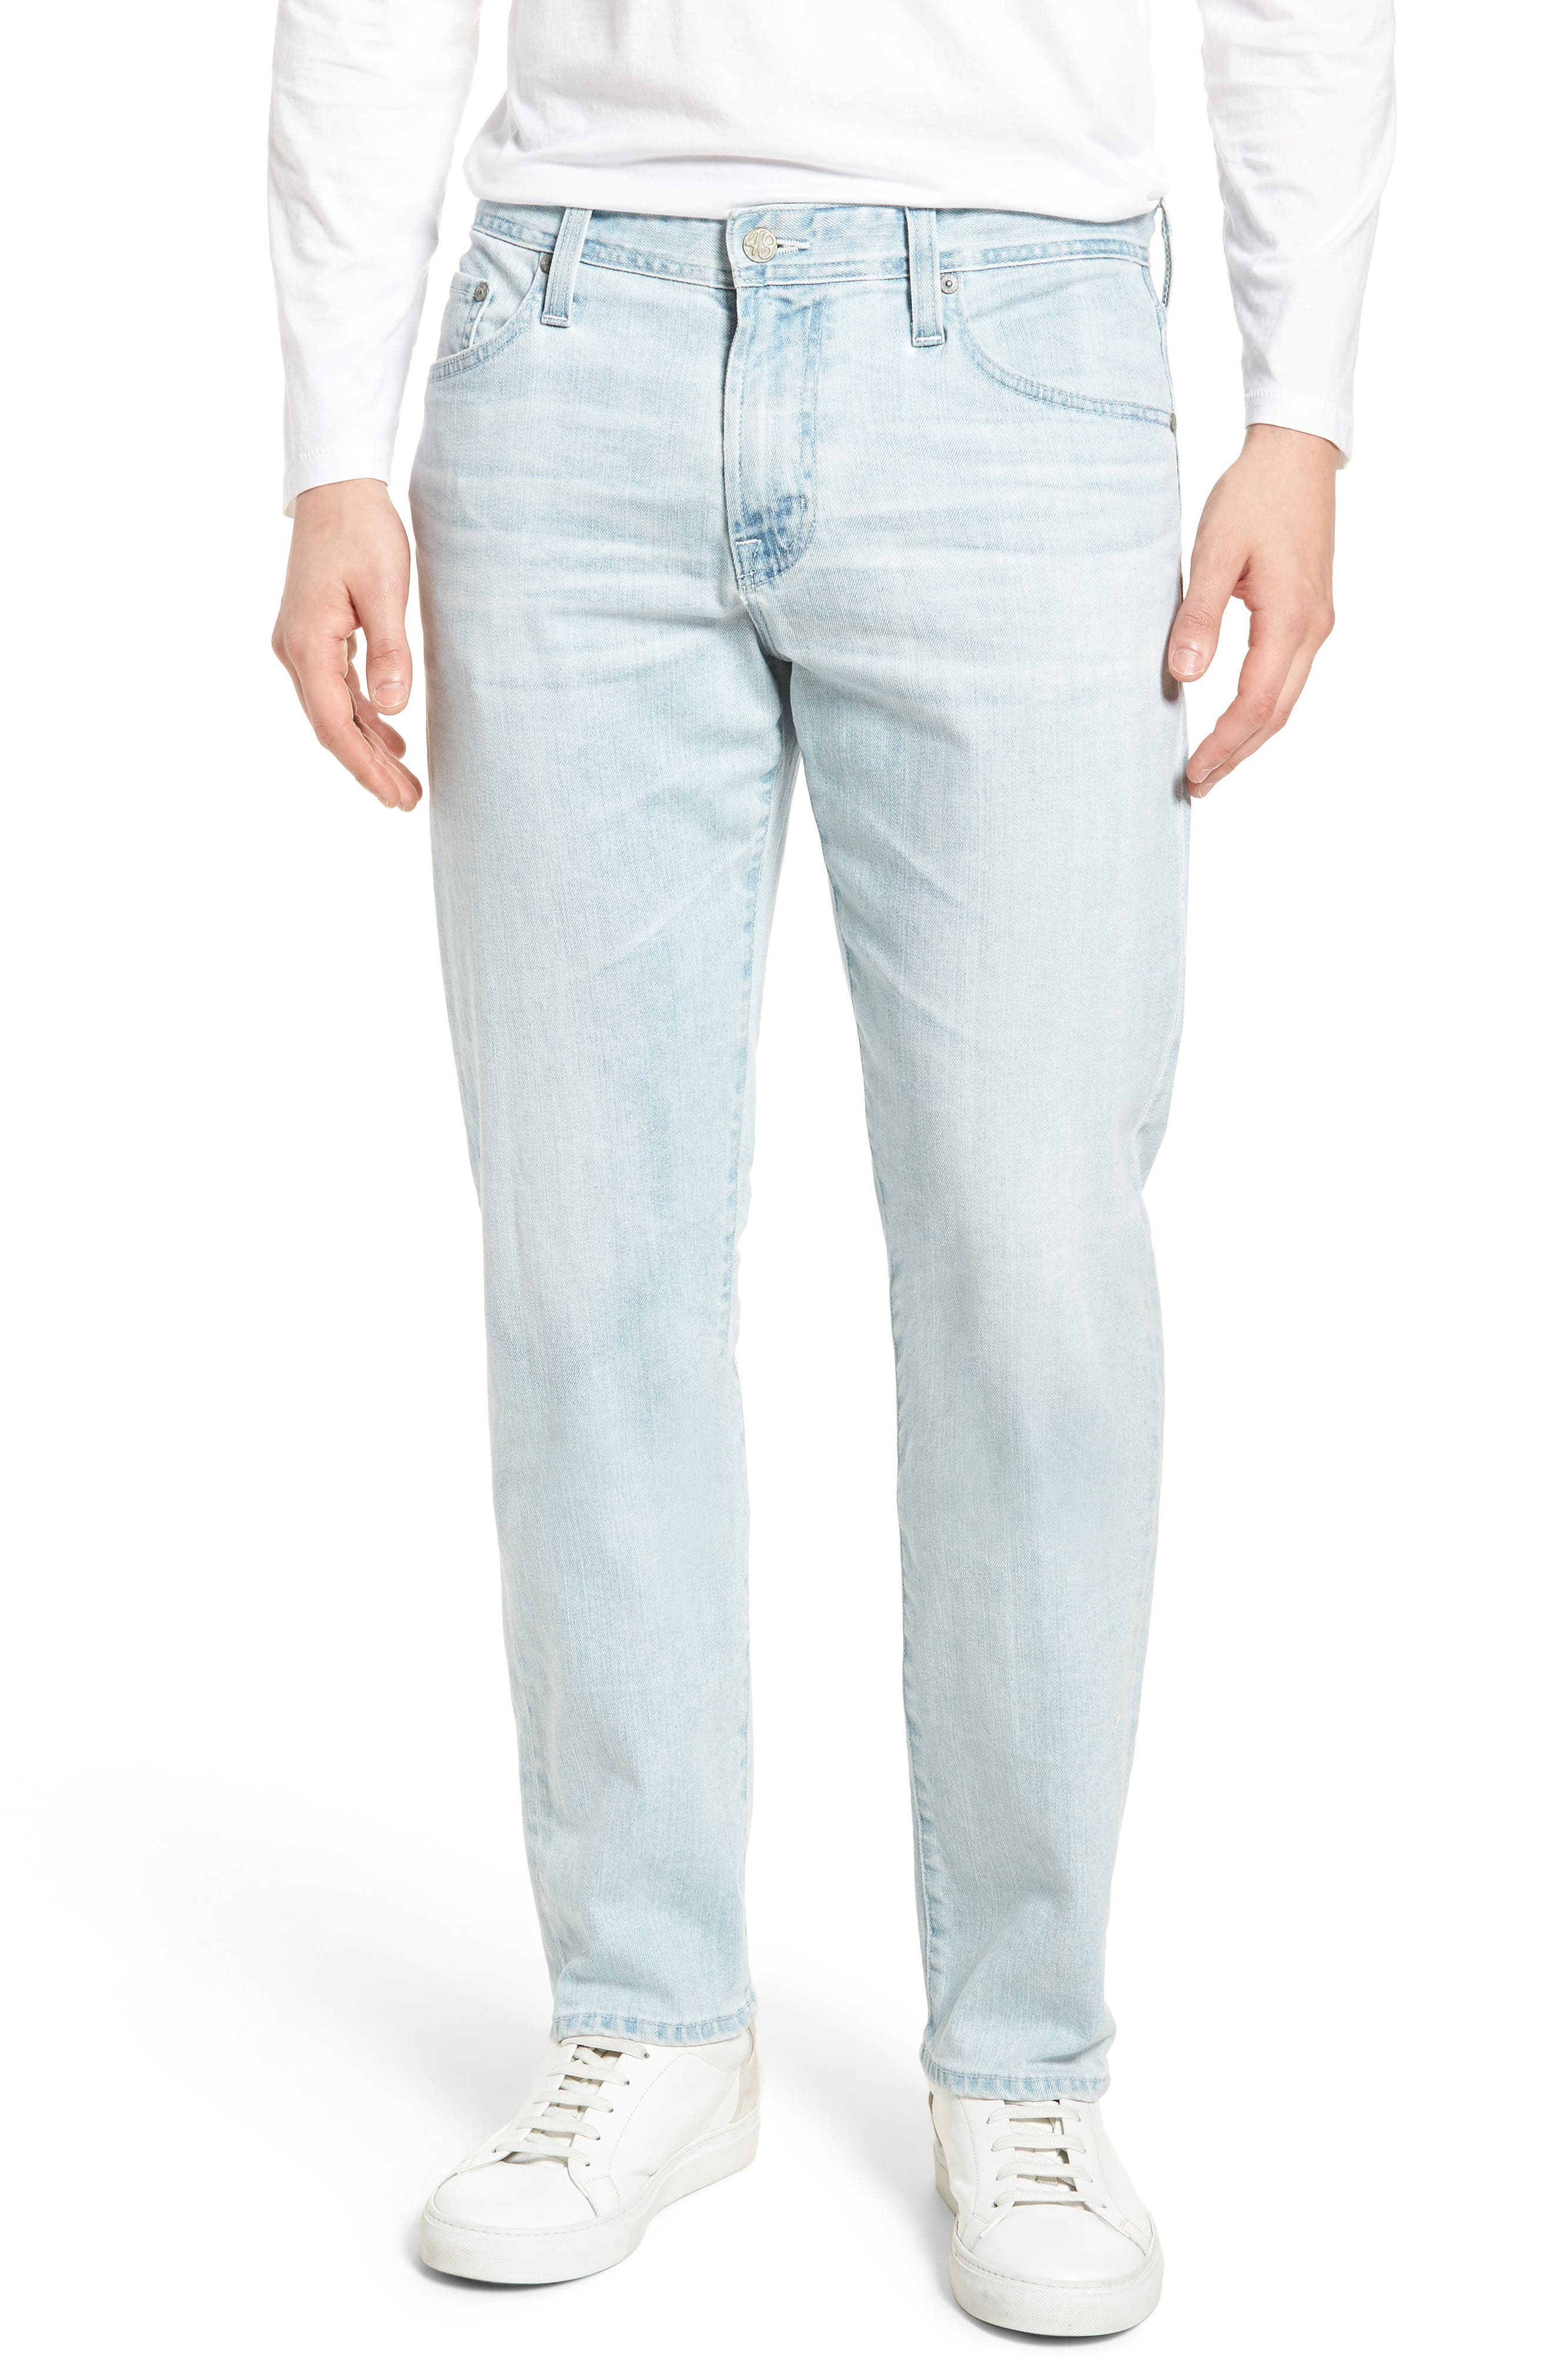 Graduate Slim Straight Leg Jeans,                         Main,                         color, 400